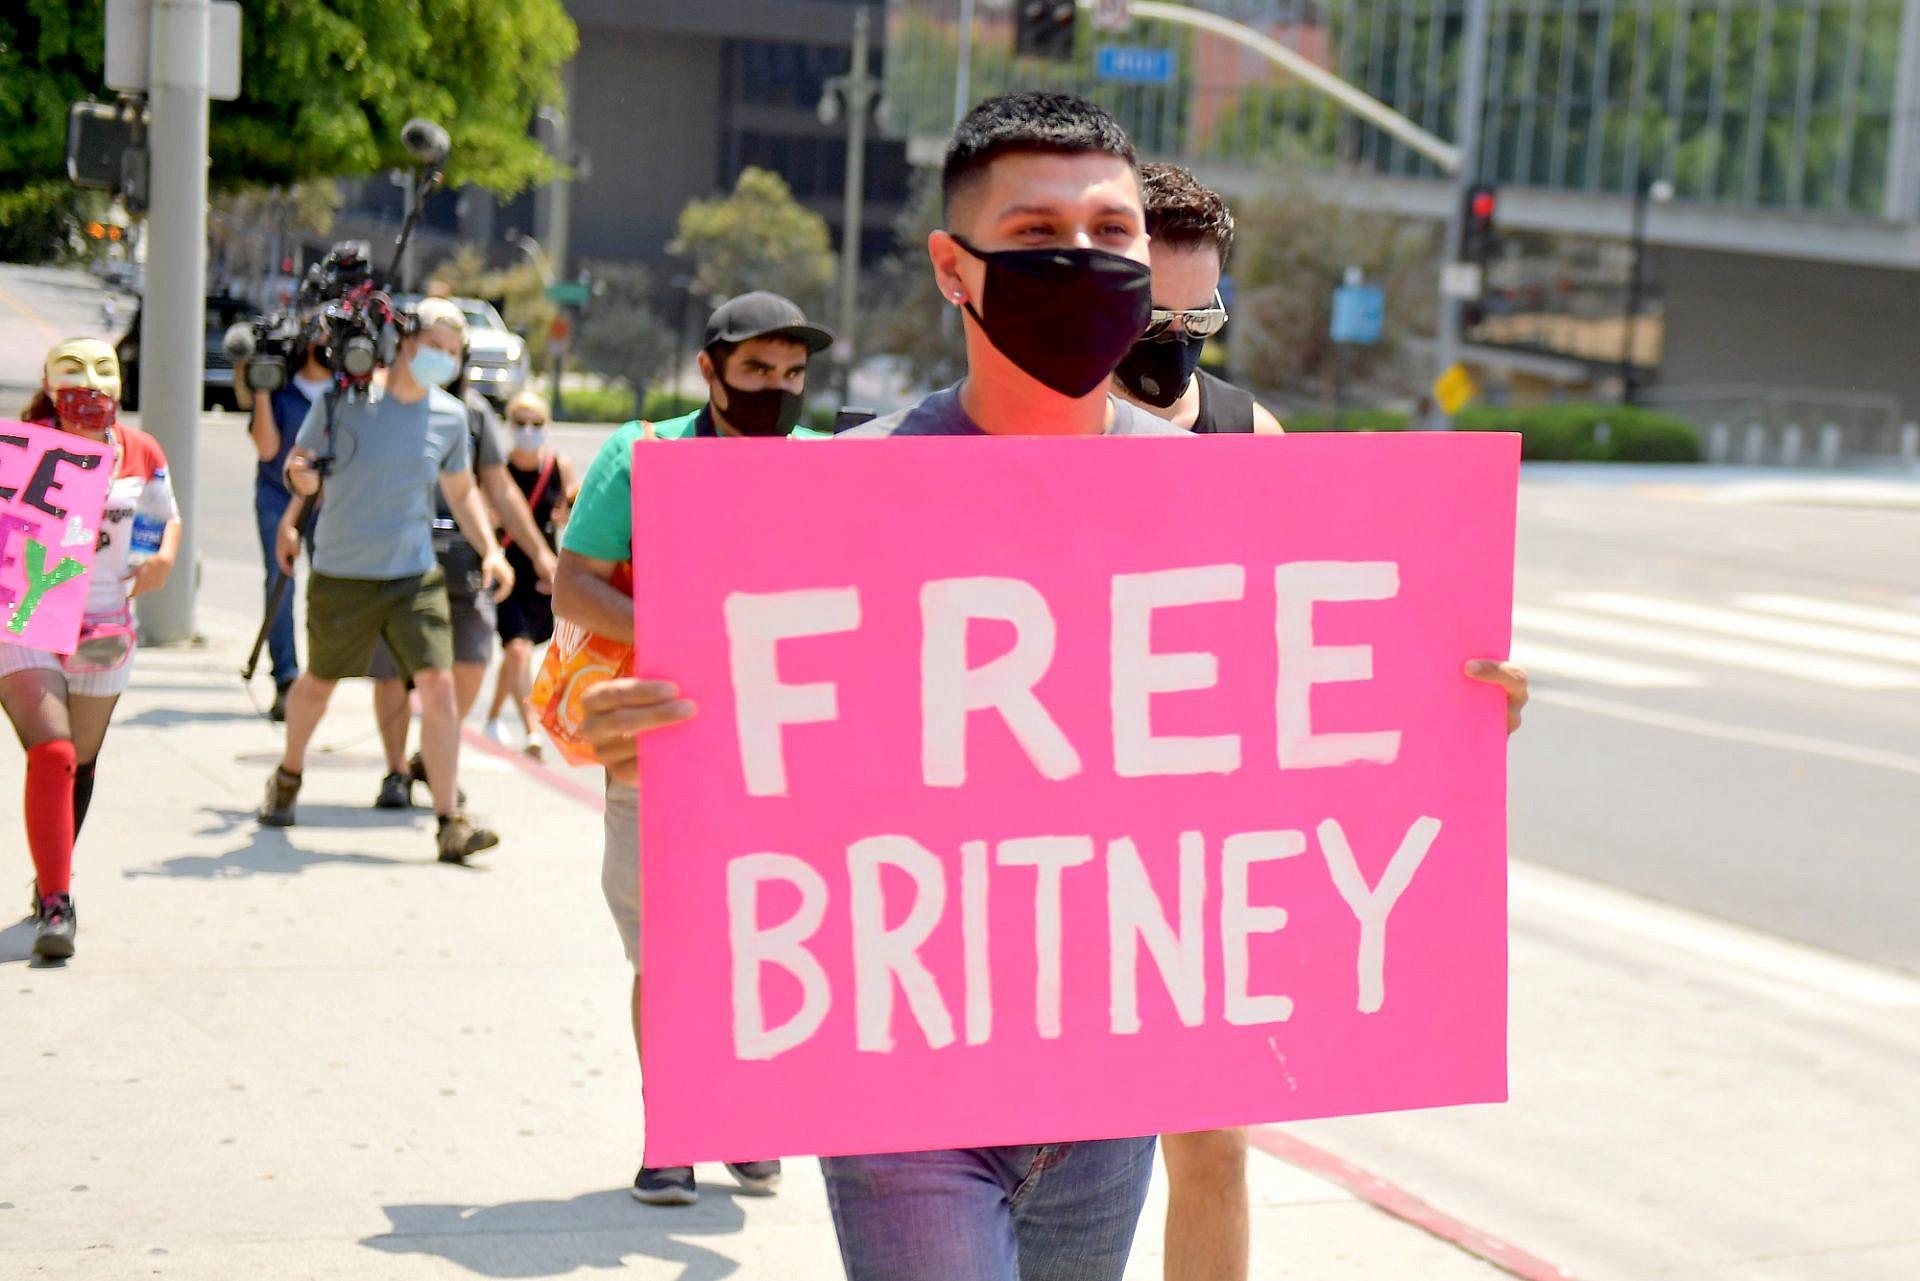 מעריצי ספירס מפגינים בלוס אנג'לס, אוגוסט 2020 (צילום: מאט ווינקלר\גטי אימג'ס)